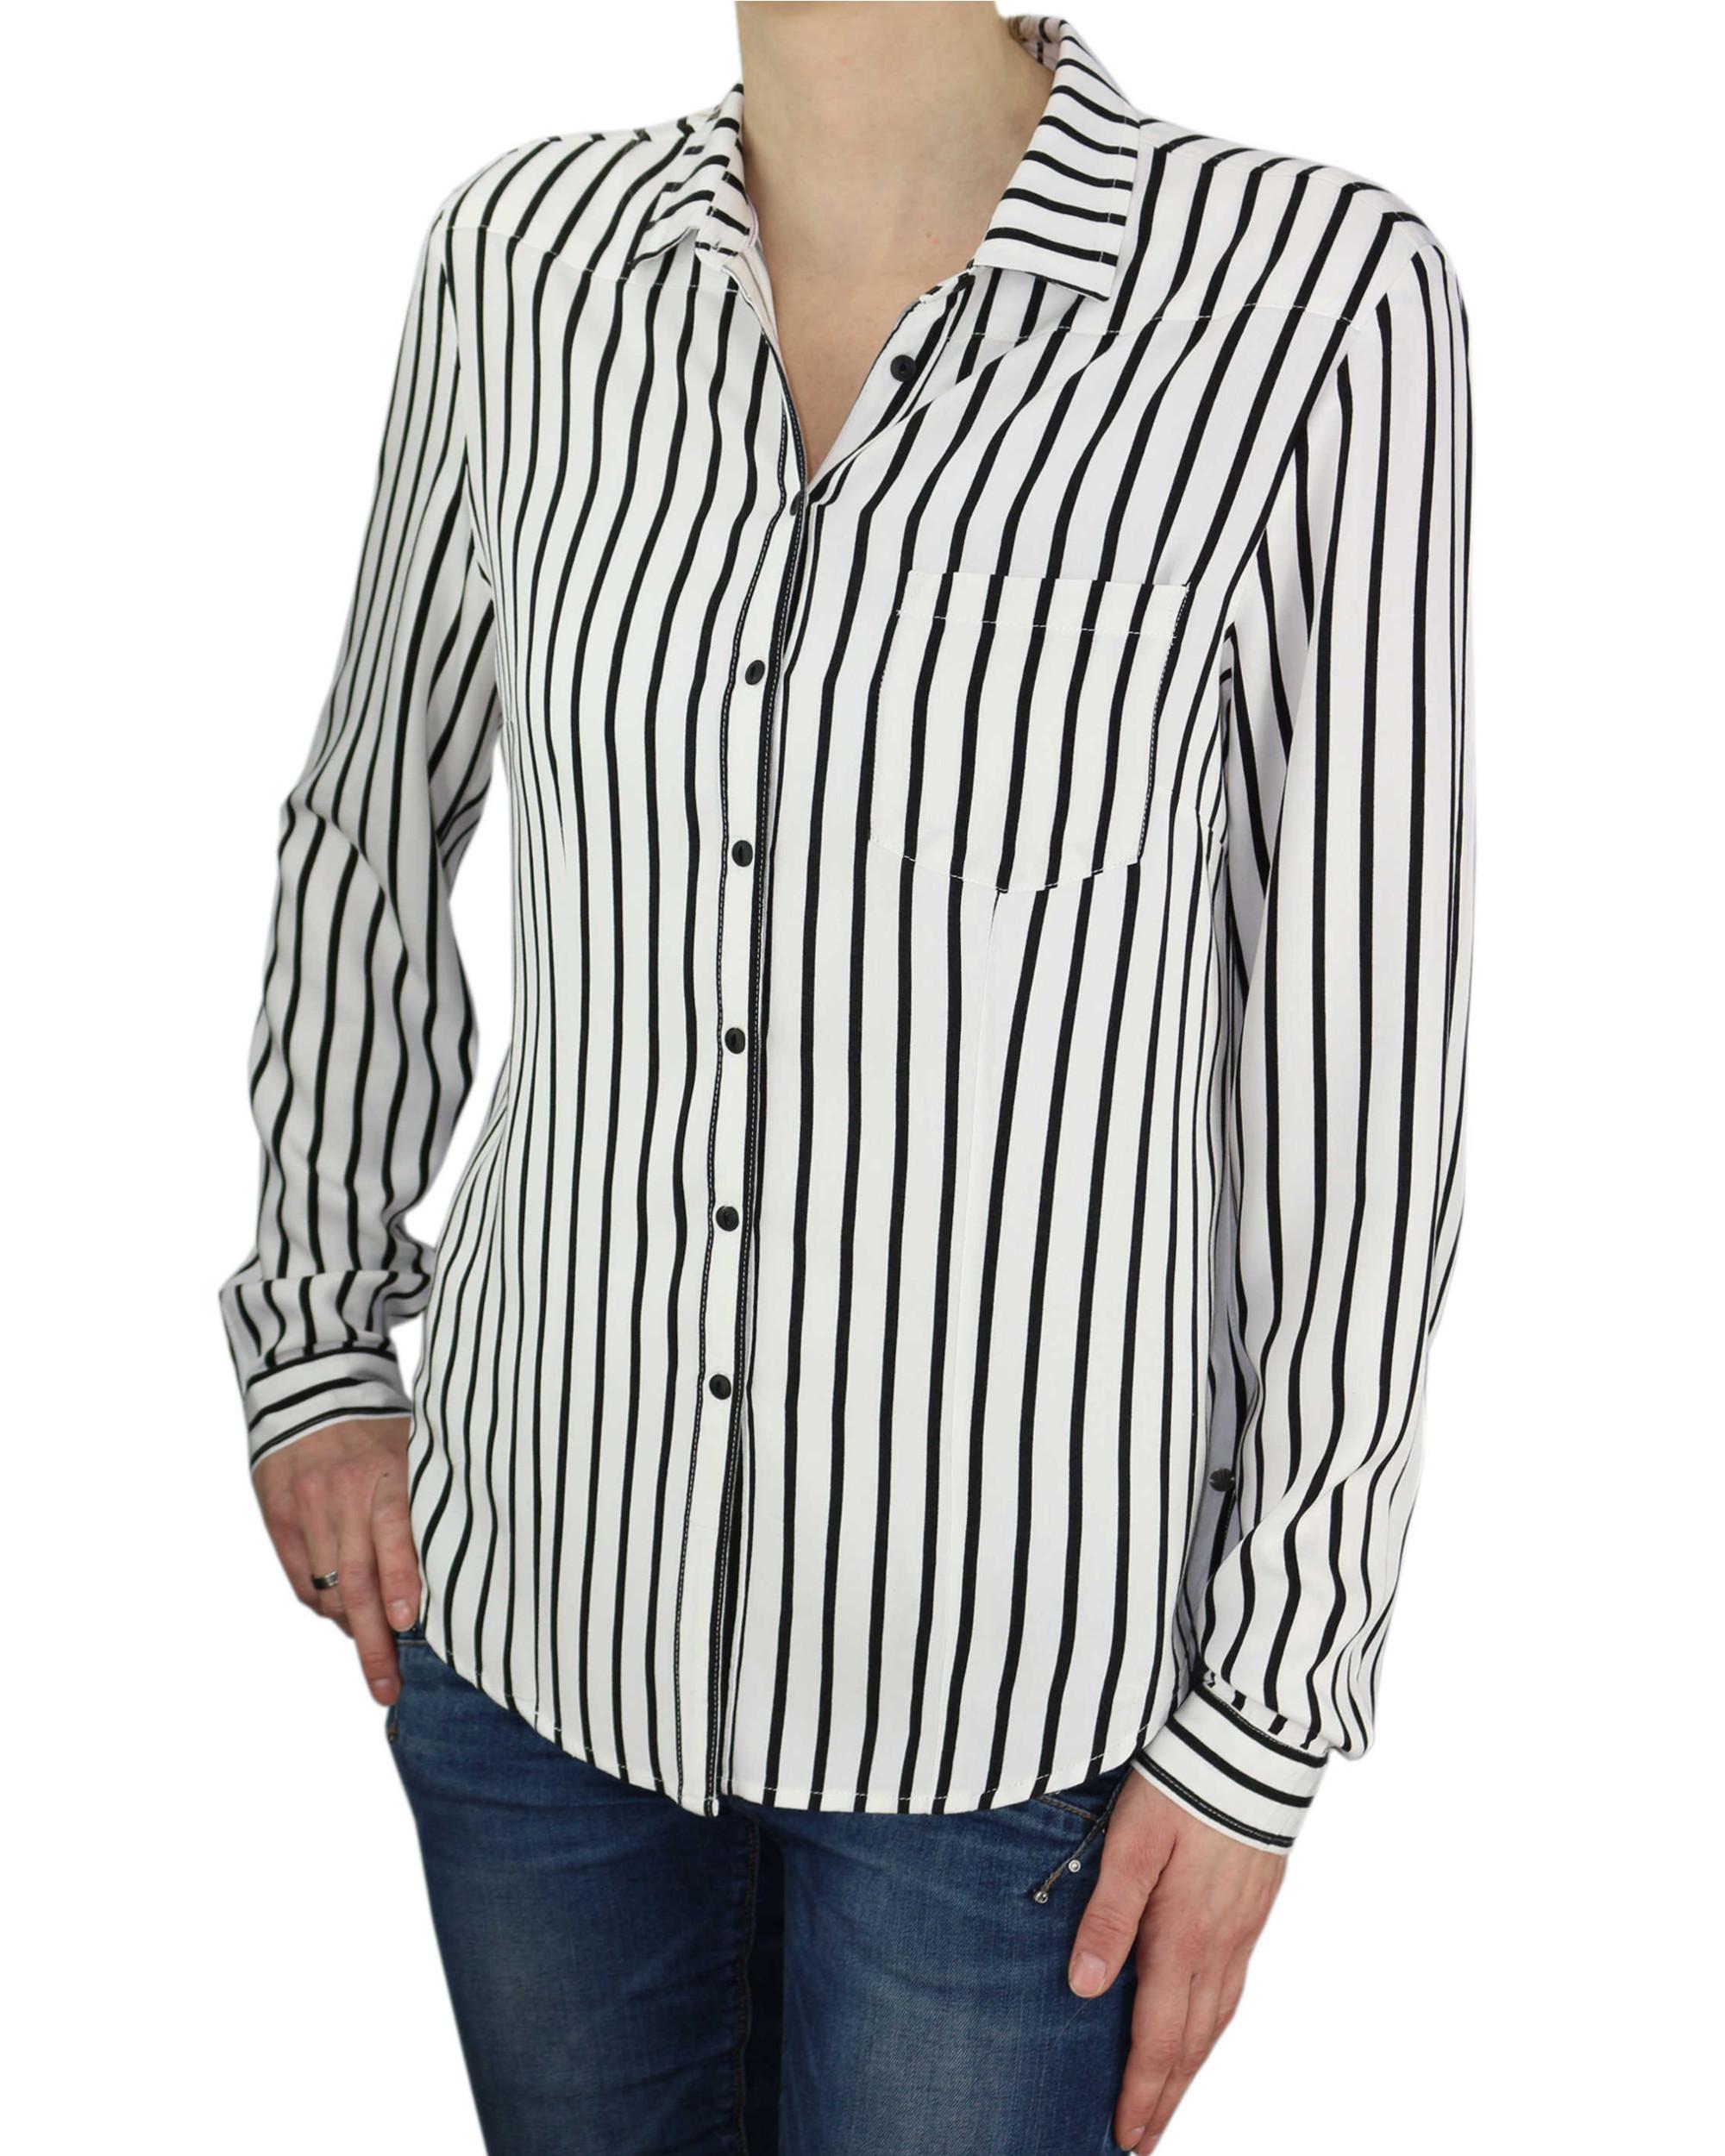 099f45c9 KHUJO Damen Bluse Tunika CONNY Shirt Streifen weiß schwarz langarm ...